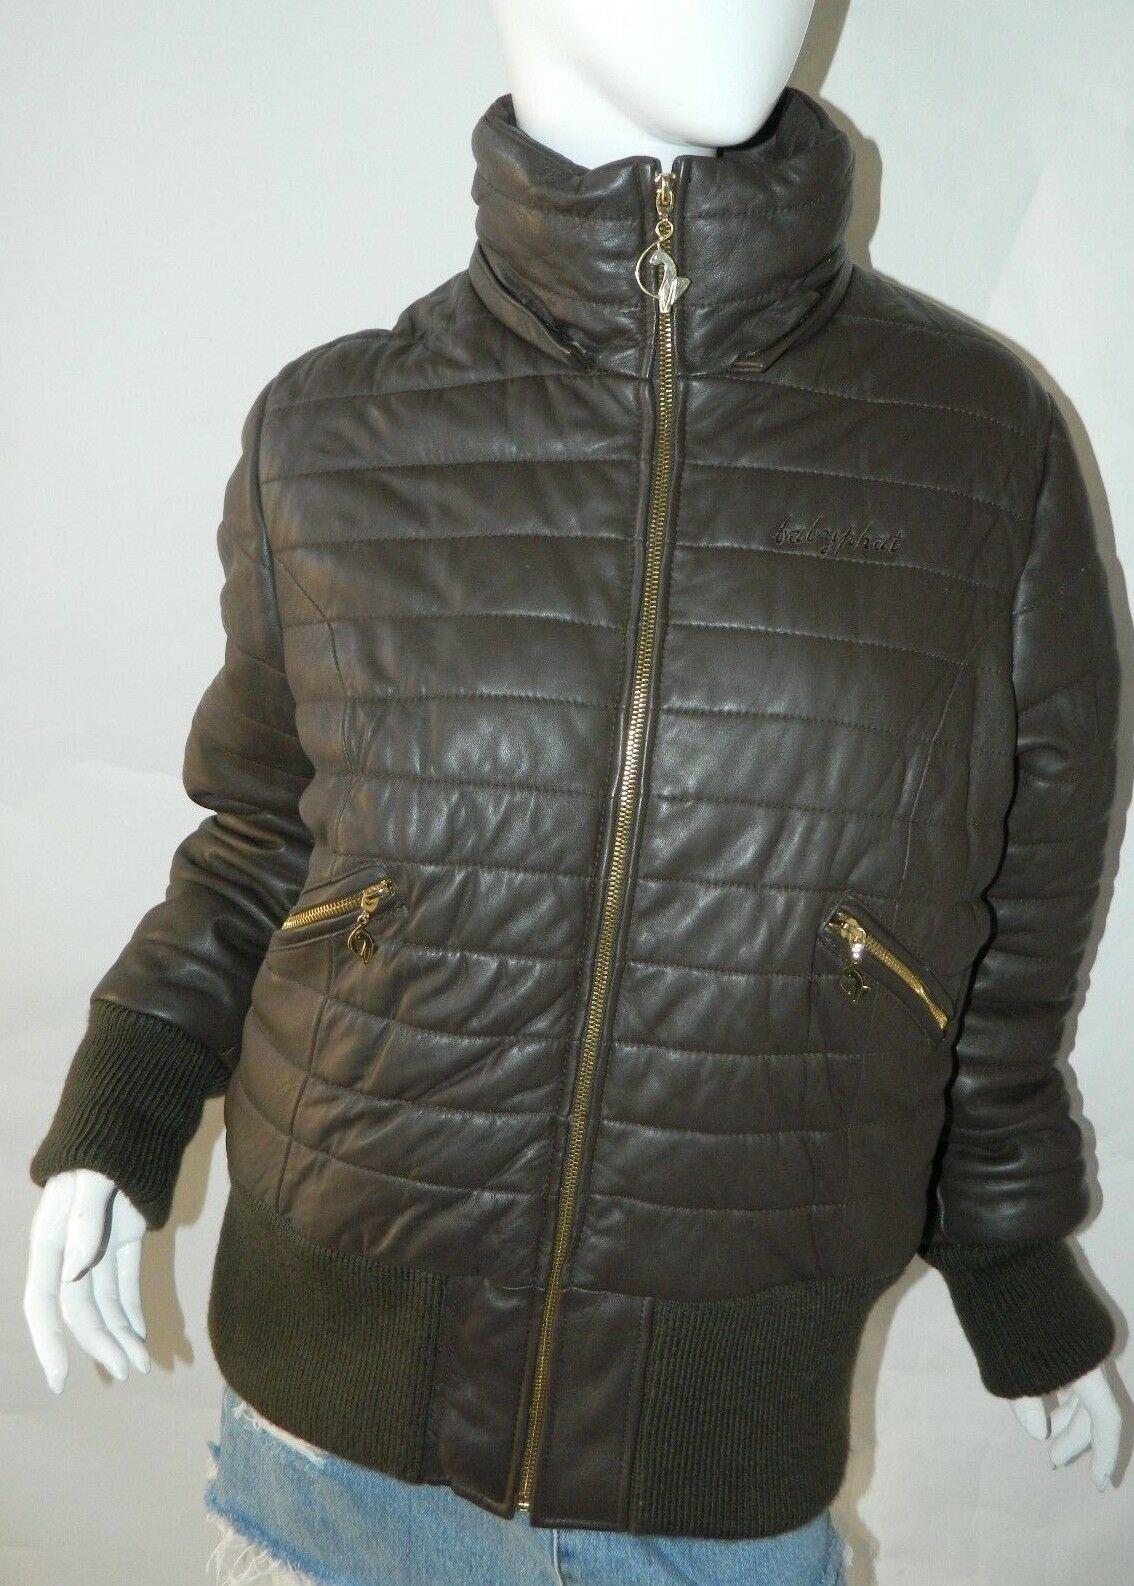 BABY PHAT Jacket Puffer Leather Kimora Lee Simmons Brown Coat XX-Large